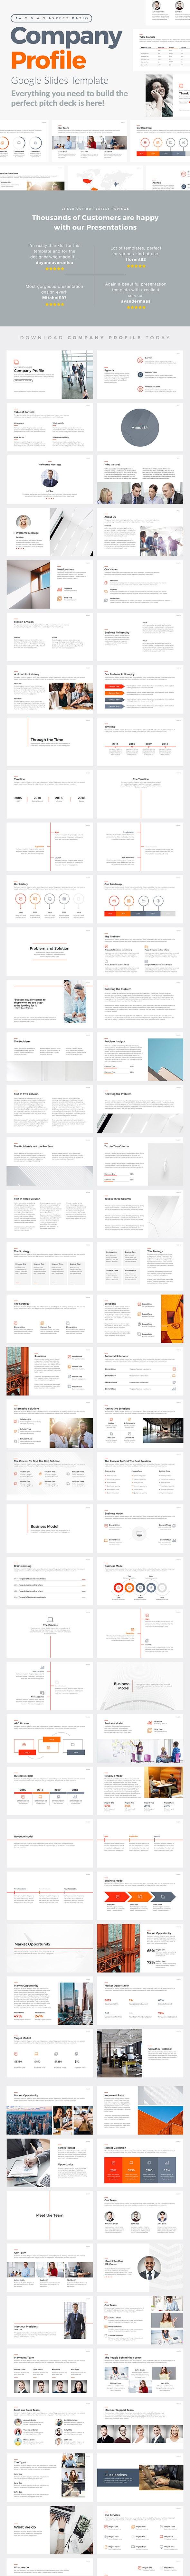 Company Profile Google Slides Template - Google Slides Presentation Templates